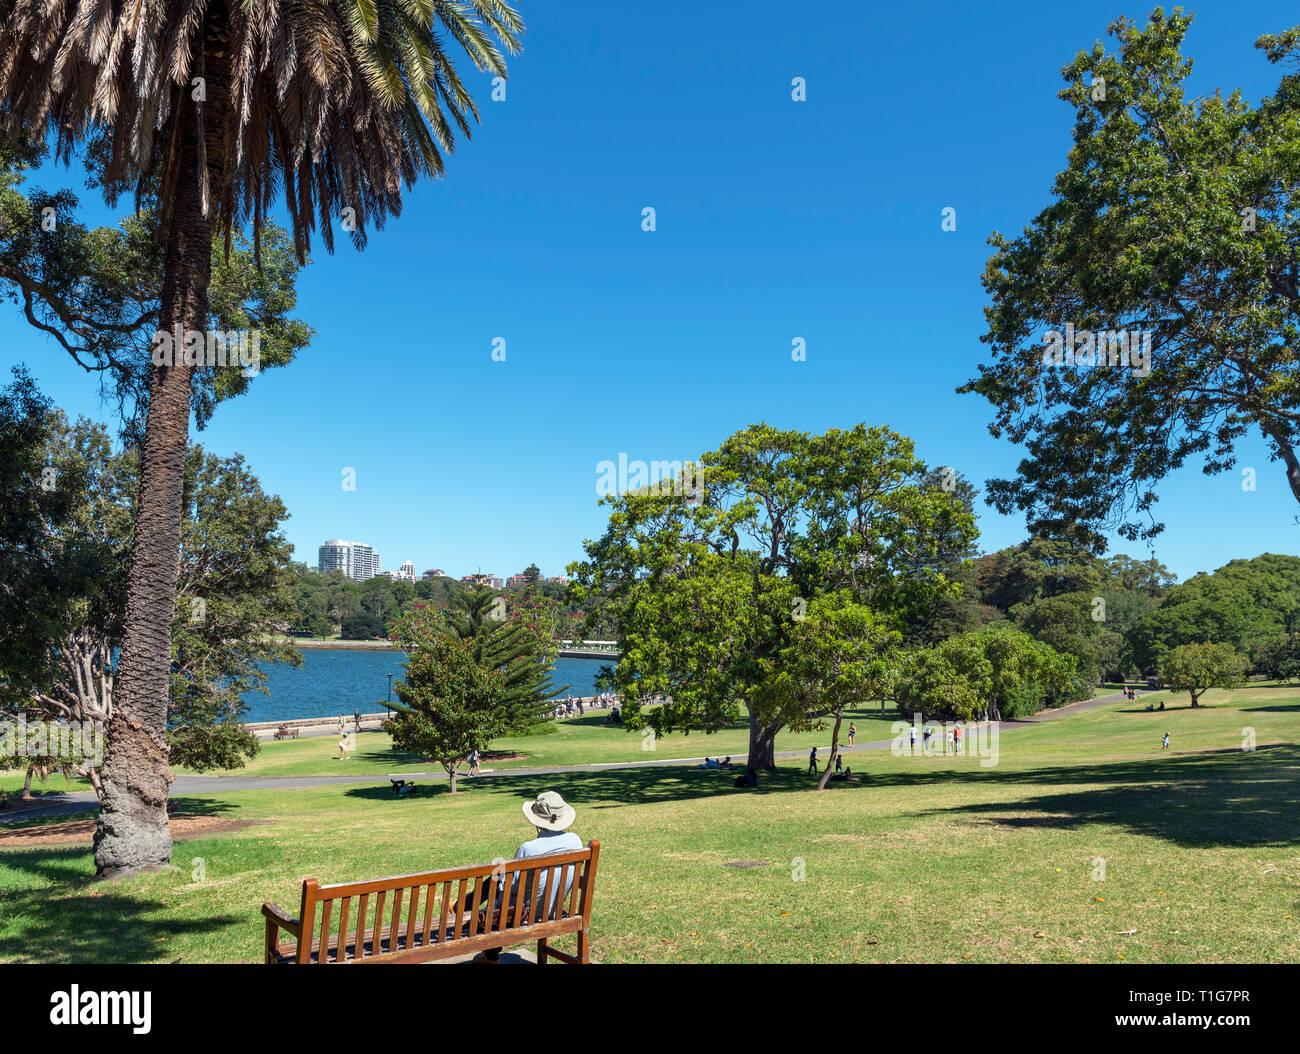 The Royal Botanic Garden, Sydney, Australia - Stock Image